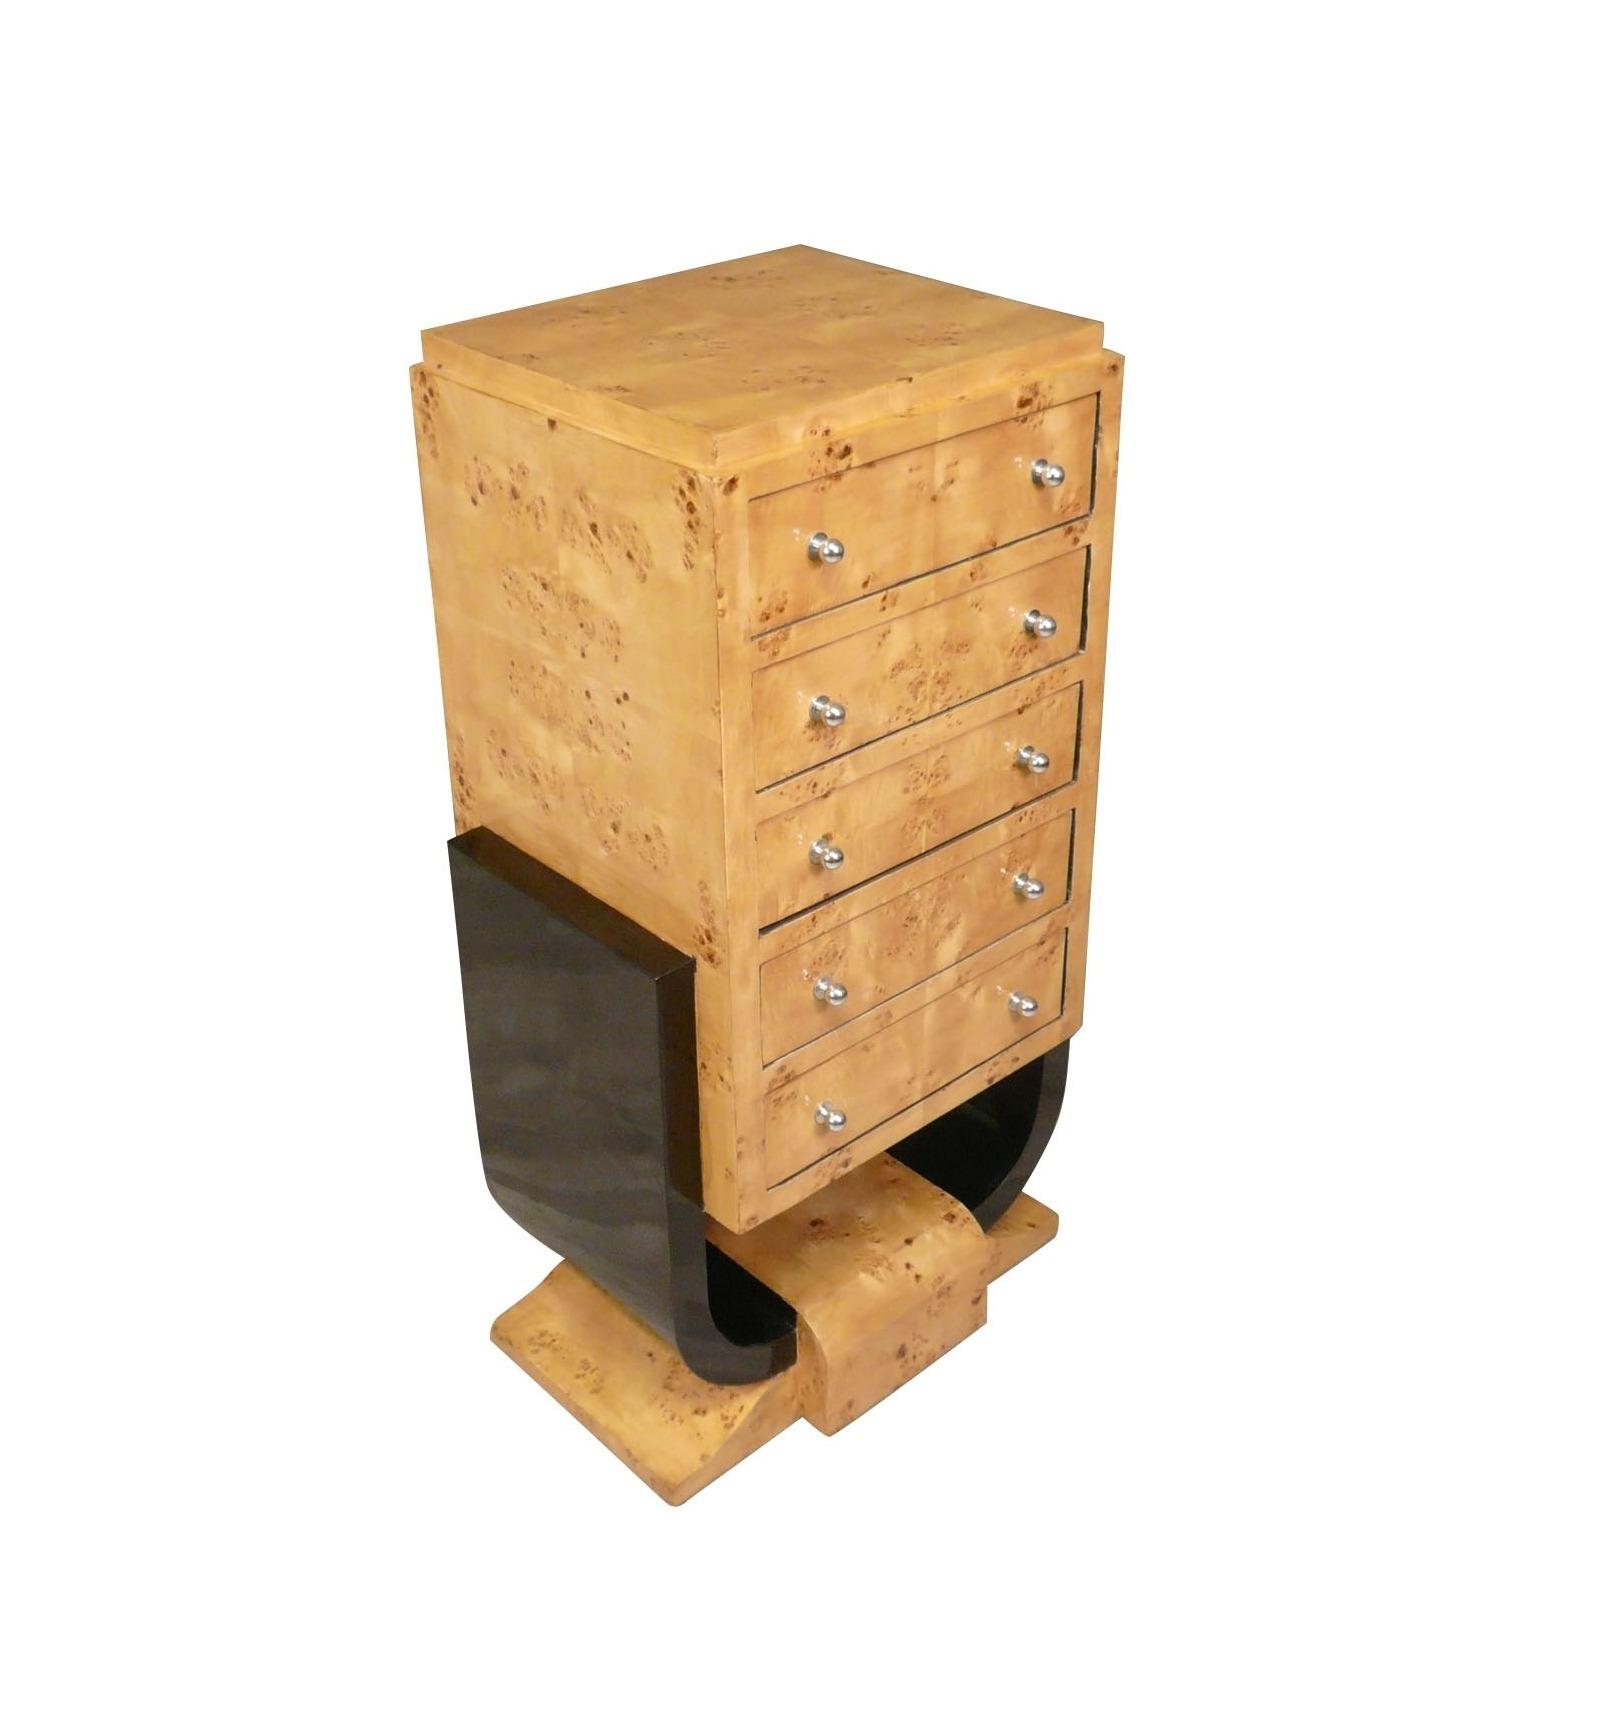 art deco console art deco m bel. Black Bedroom Furniture Sets. Home Design Ideas